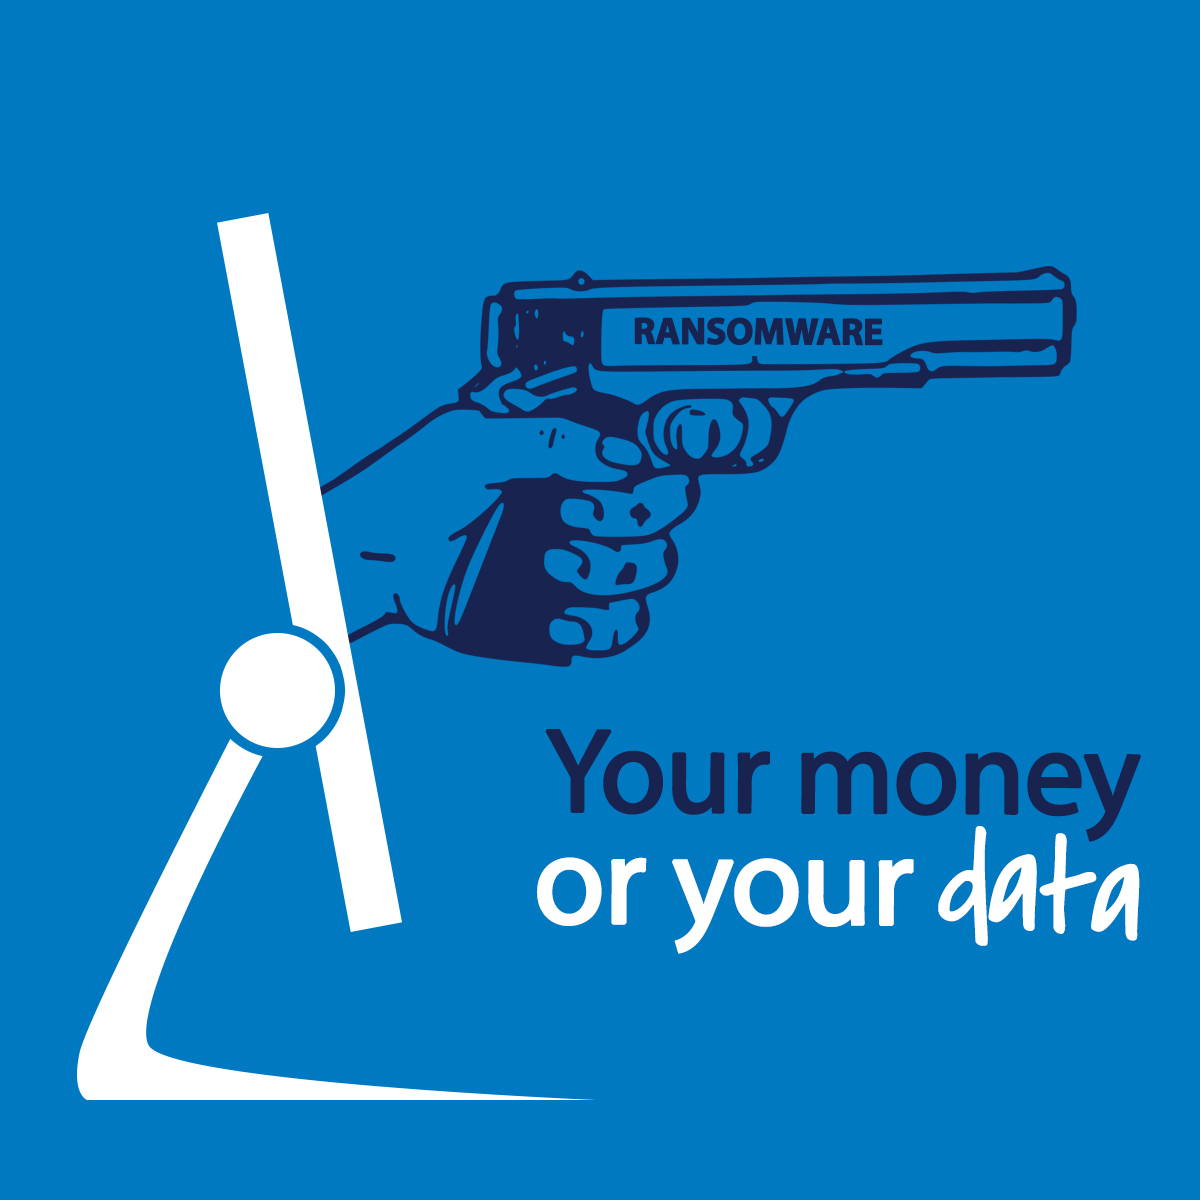 uninstall decrypthelp@qq.com Ransomware